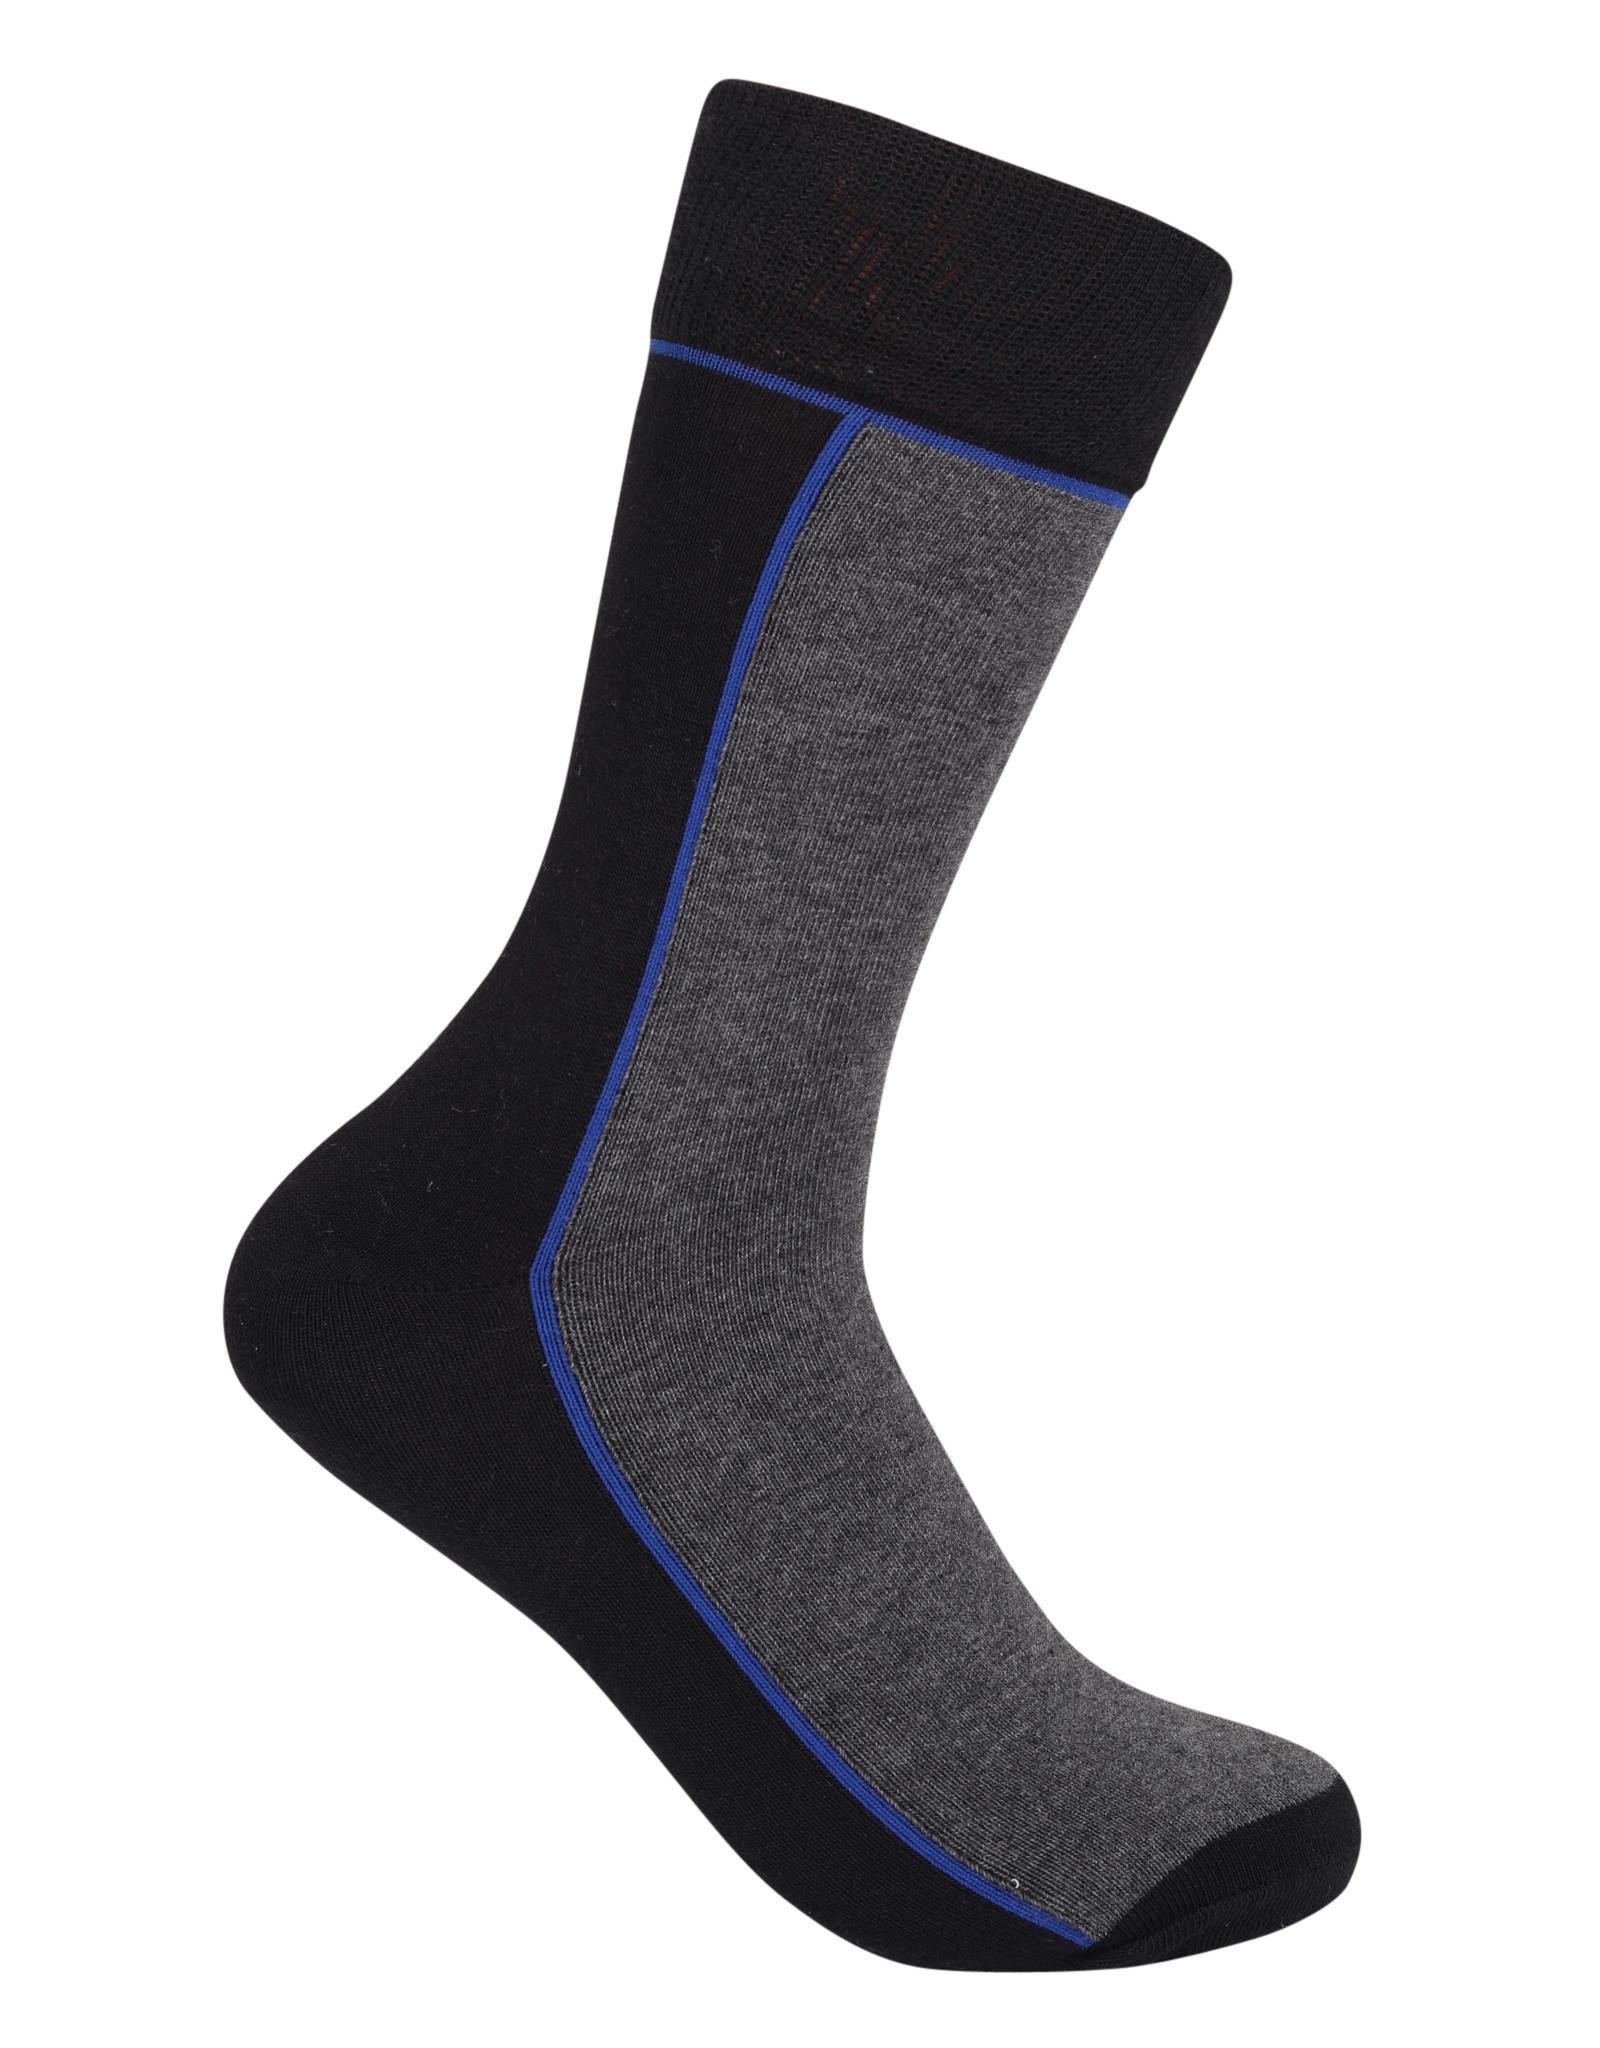 Zubii Zubii Colorblock Mens Sock